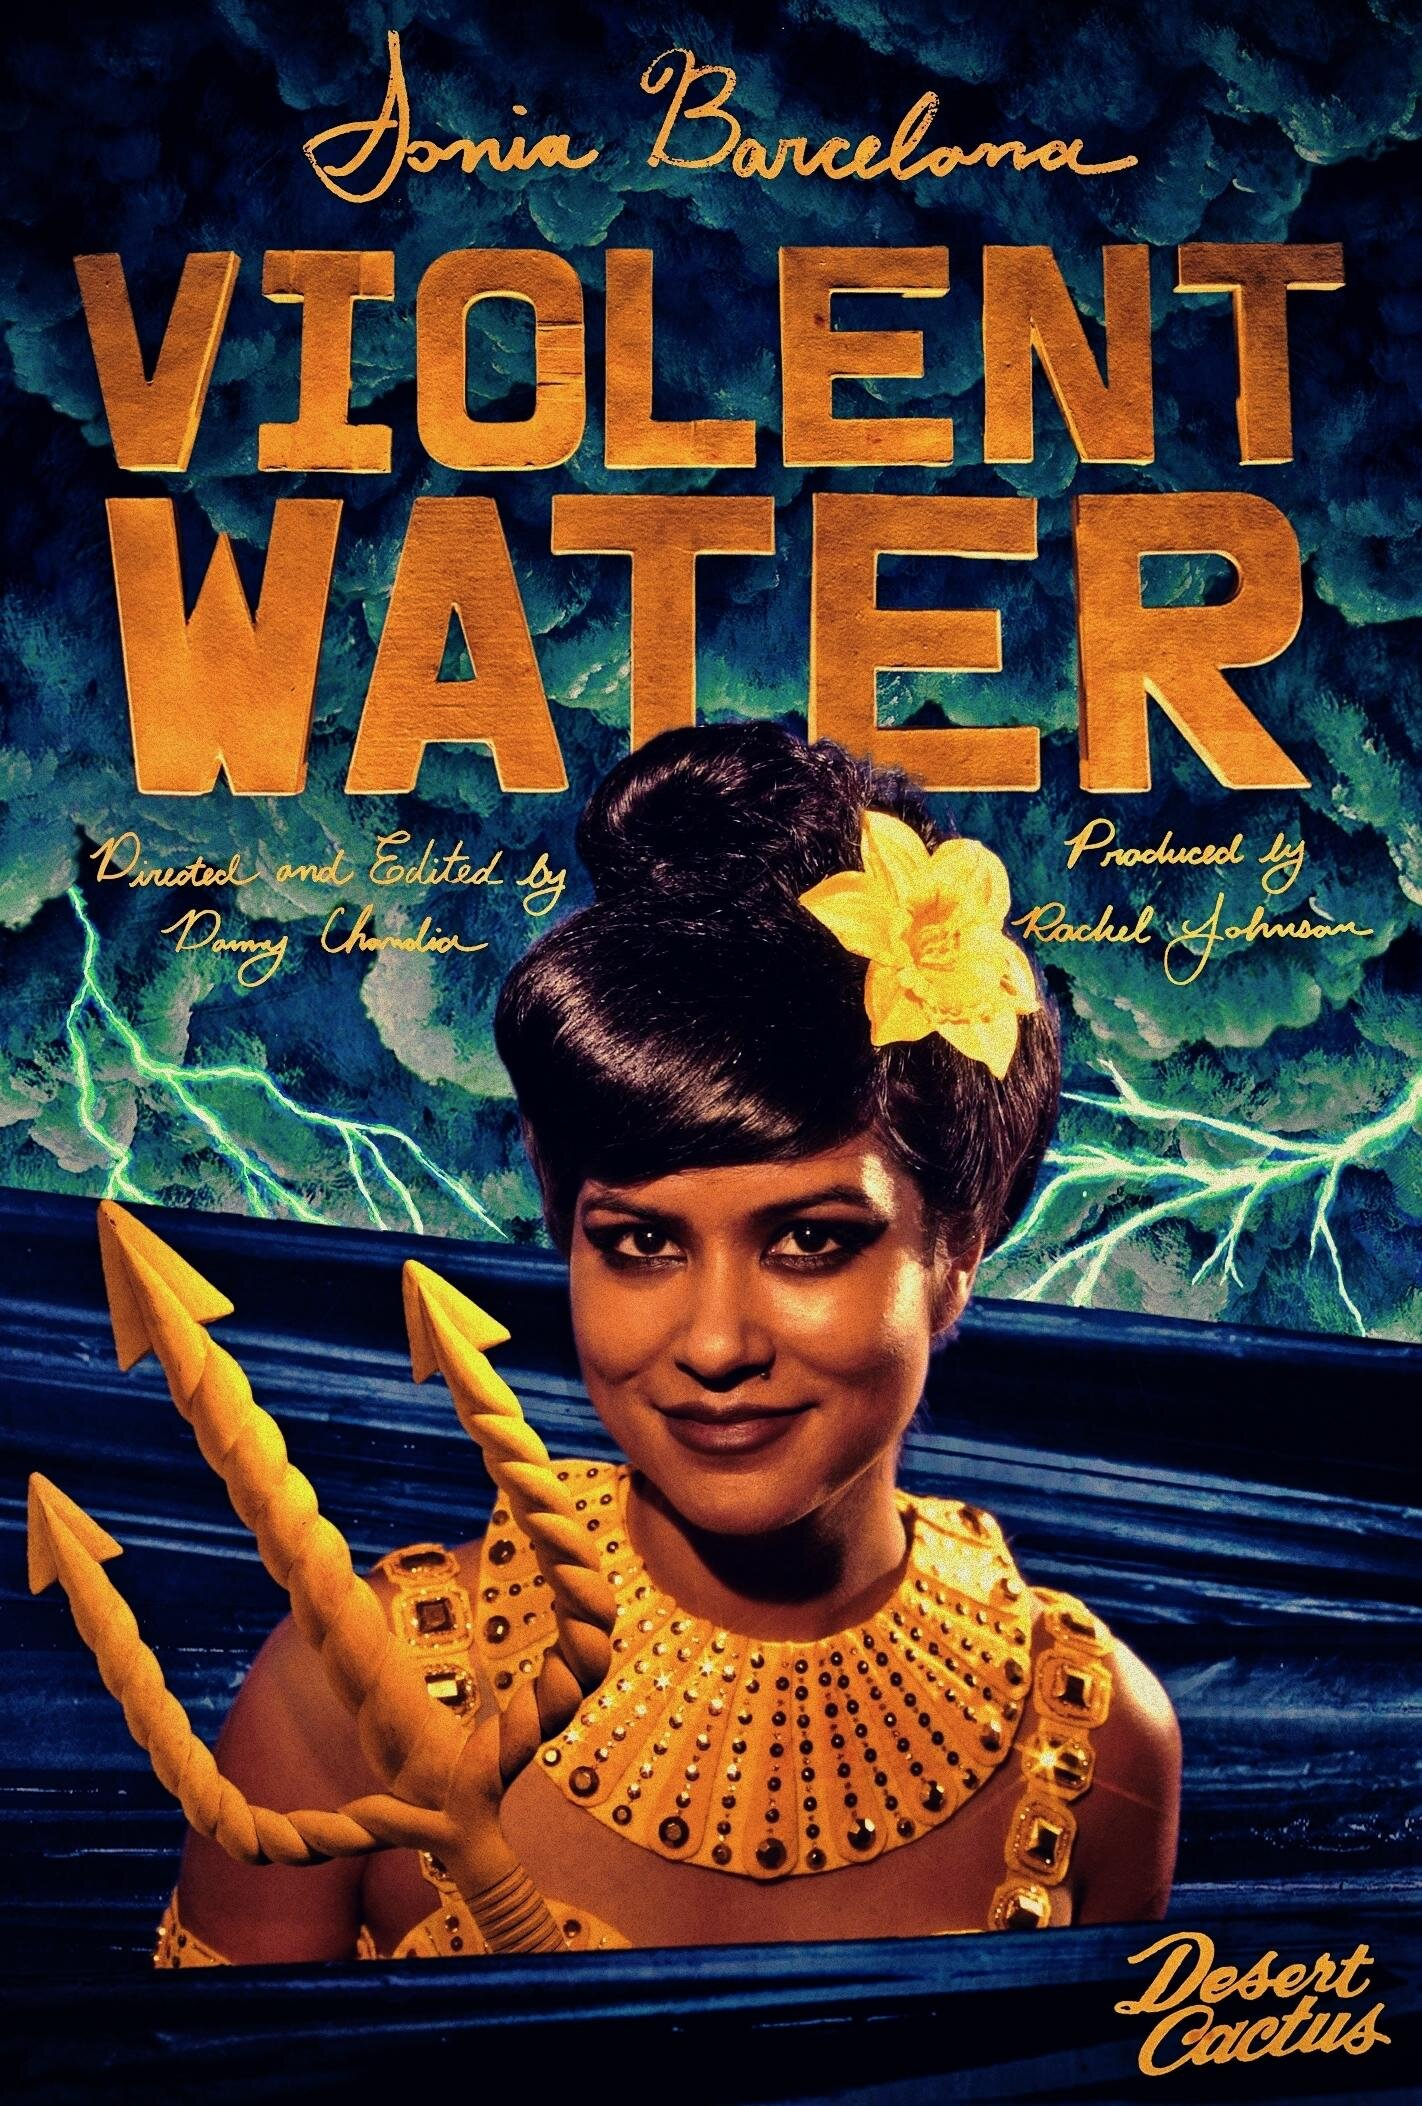 Best Music Video - VIOLENT WATER